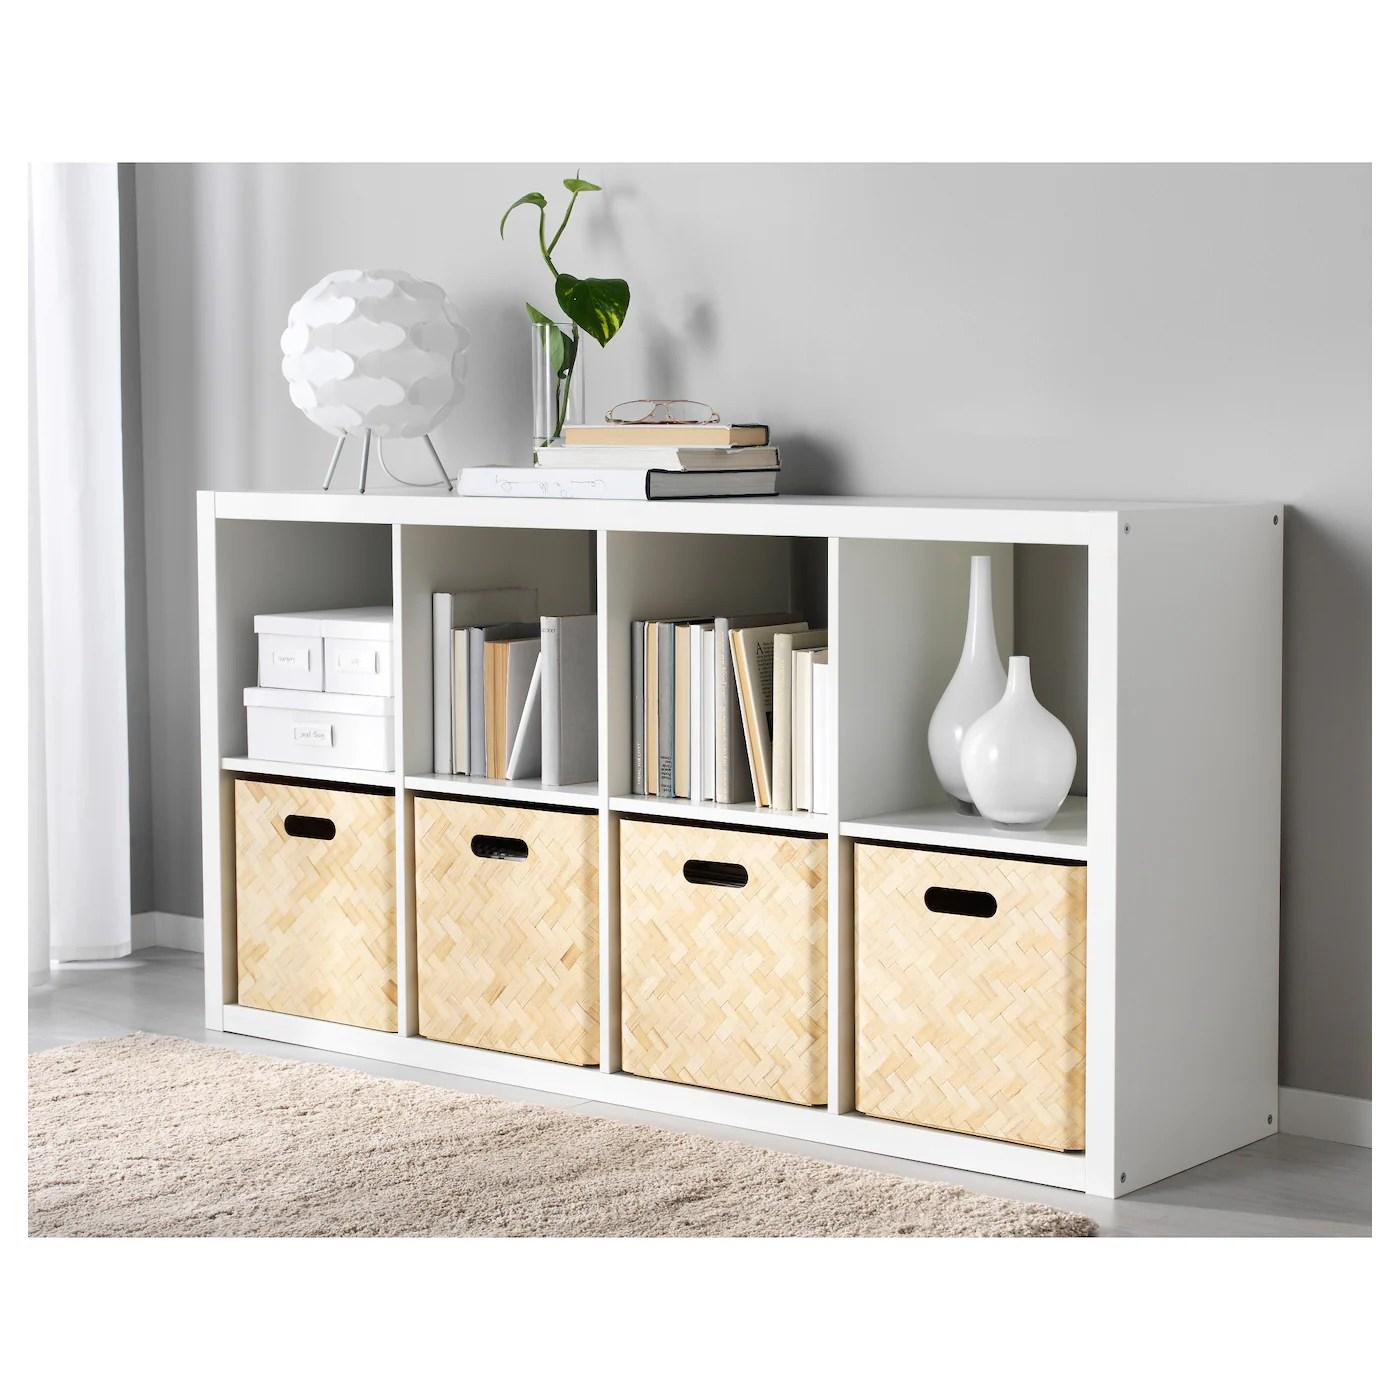 Ikea Mobelfusse Luxus Mobelfusse Holz Ikea Lillngen Bein Ikea Savboya